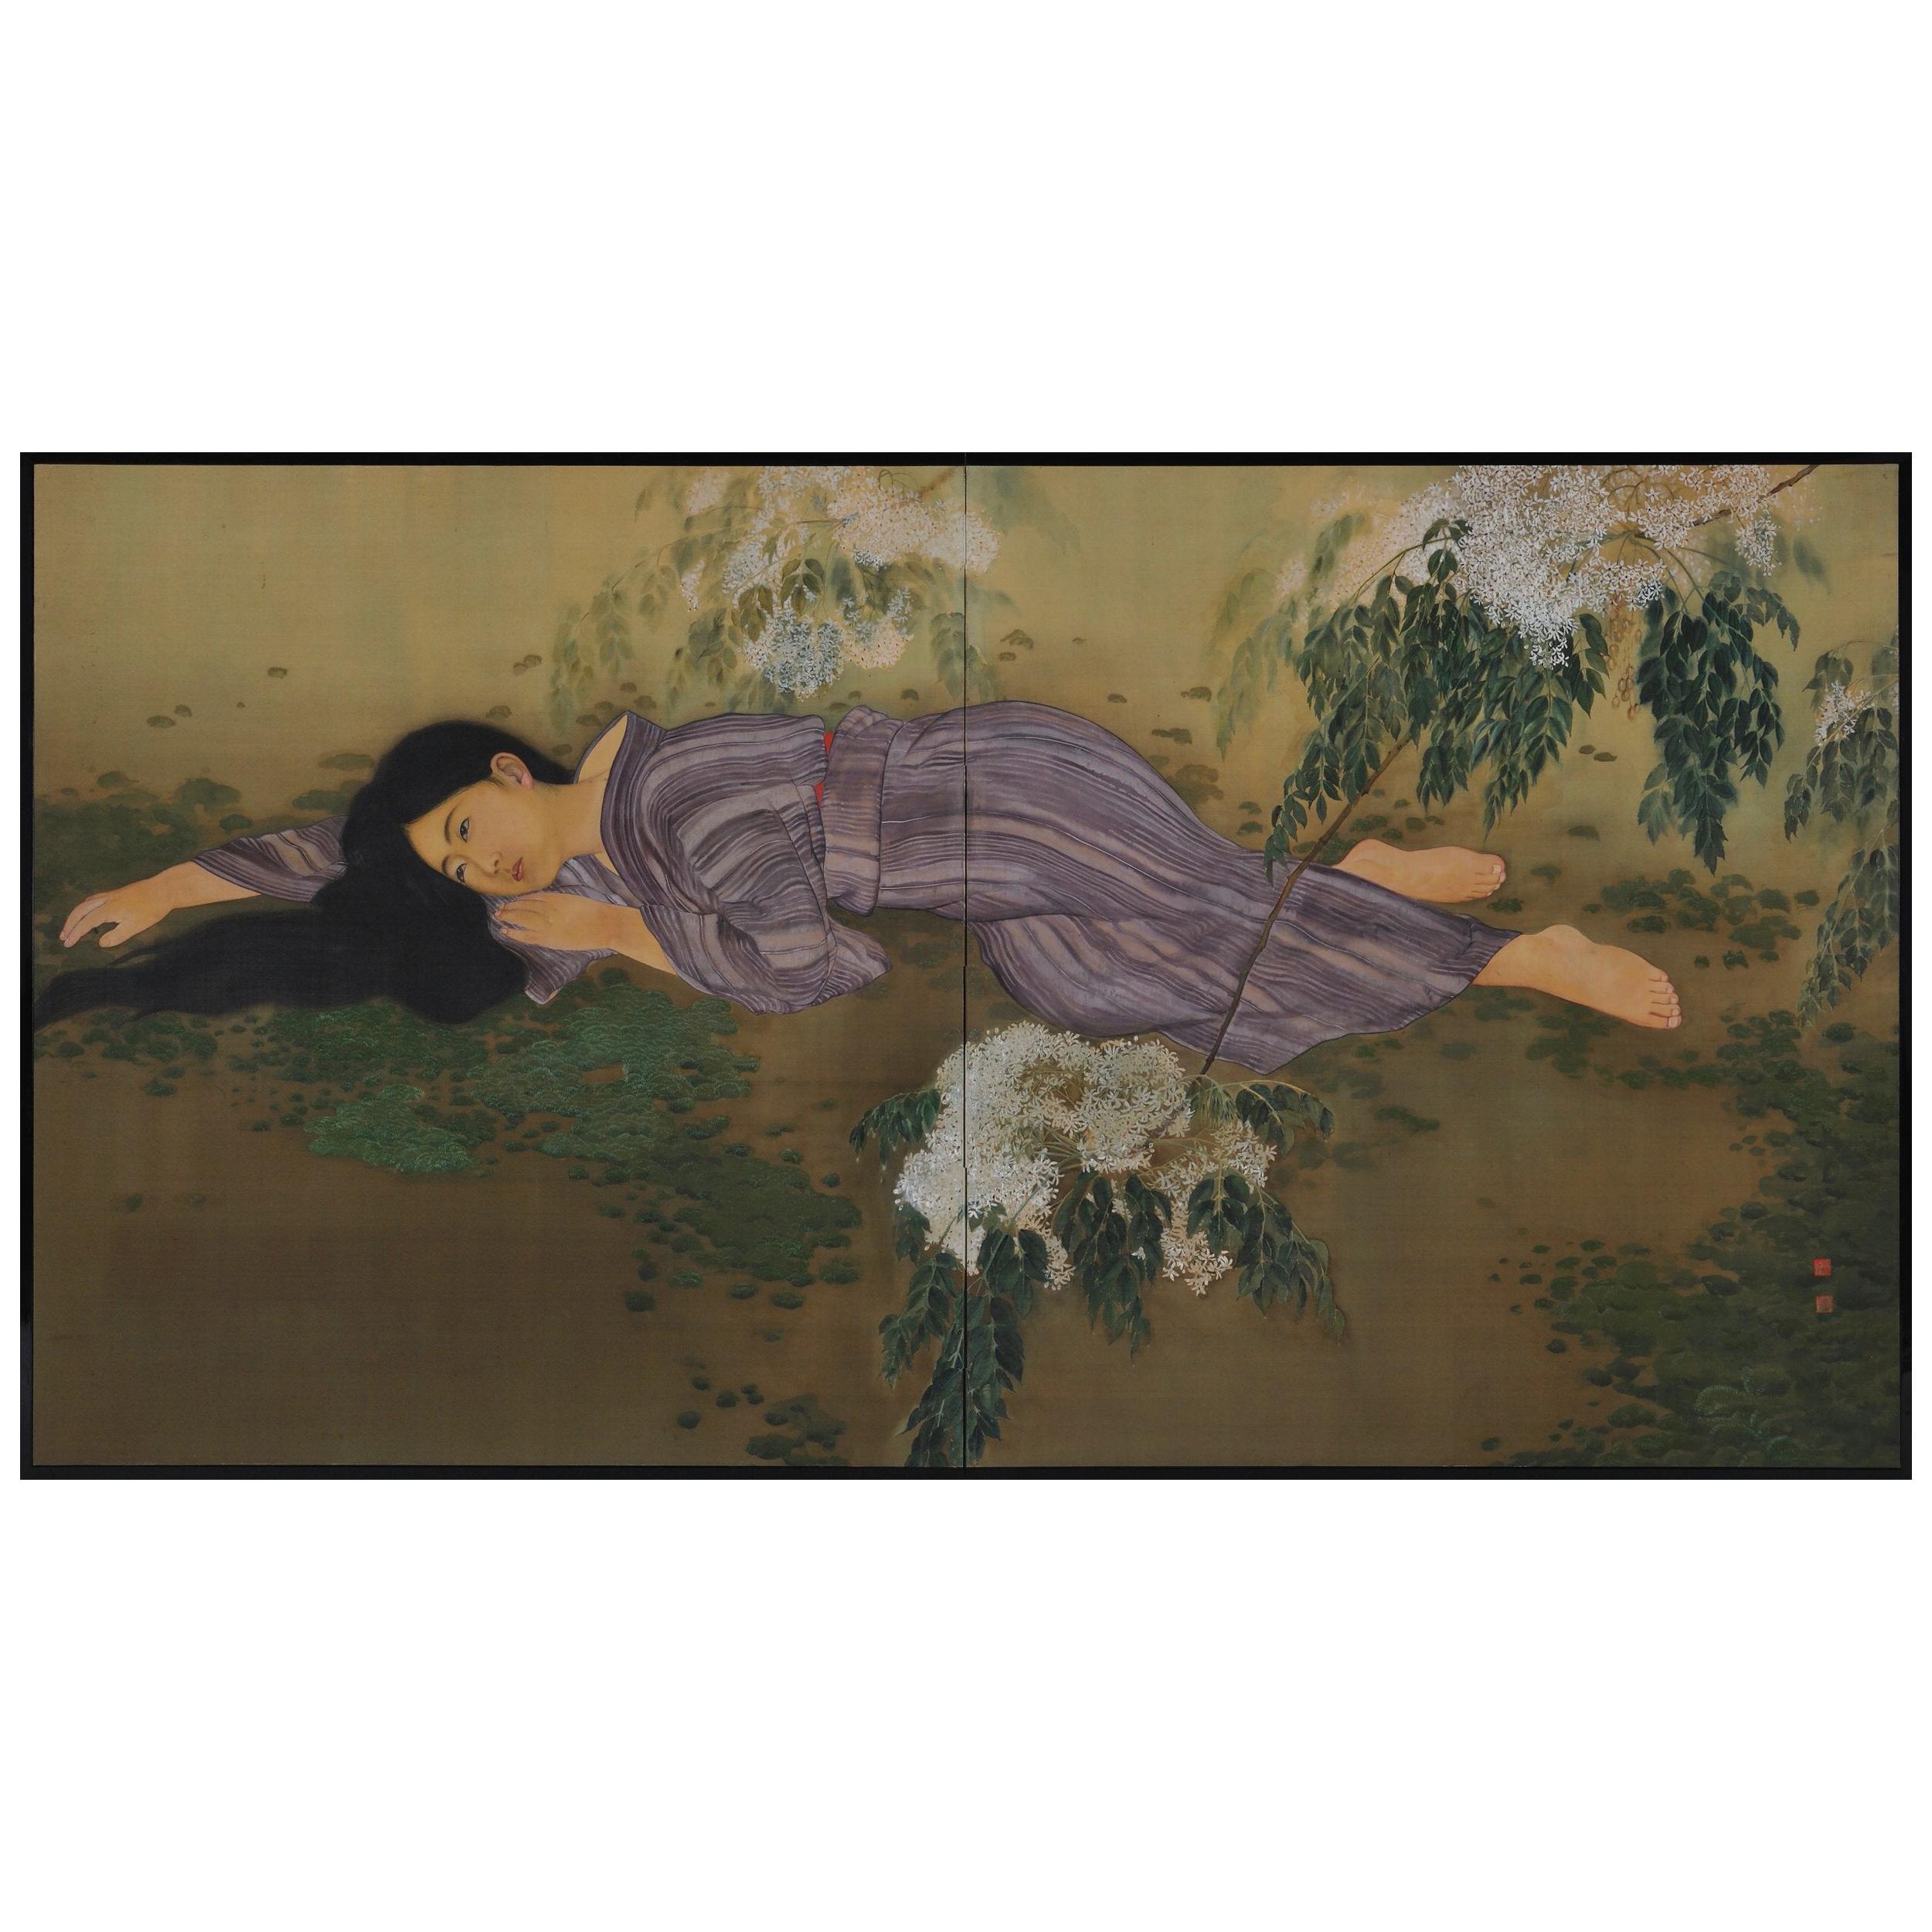 Japanese Screen, Lady under a Lilac Tree, circa 1910-1915, Taisho era.